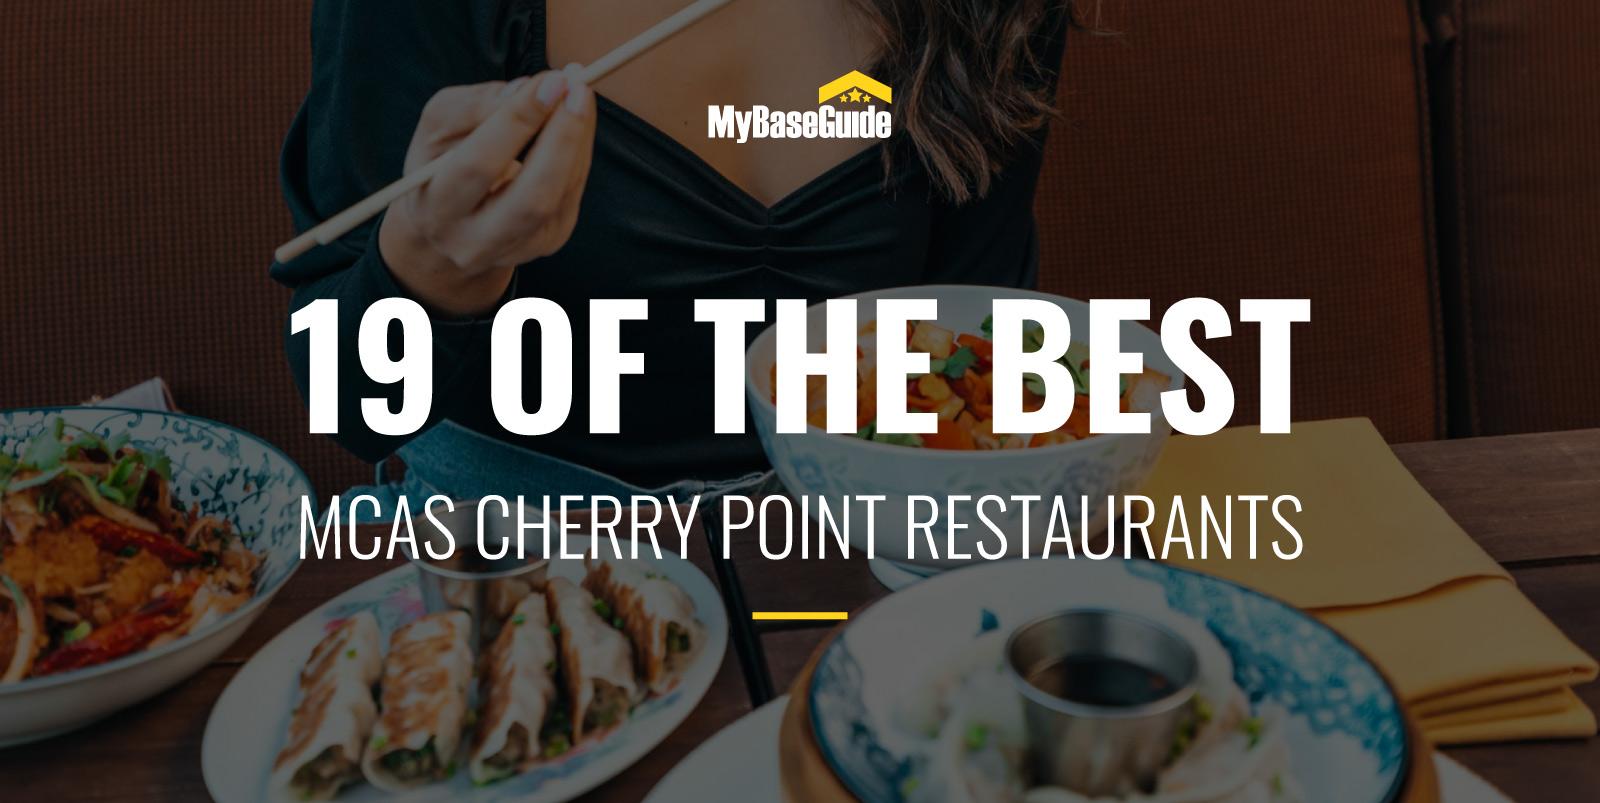 19 of the Best Restaurants Near MCAS Cherry Point